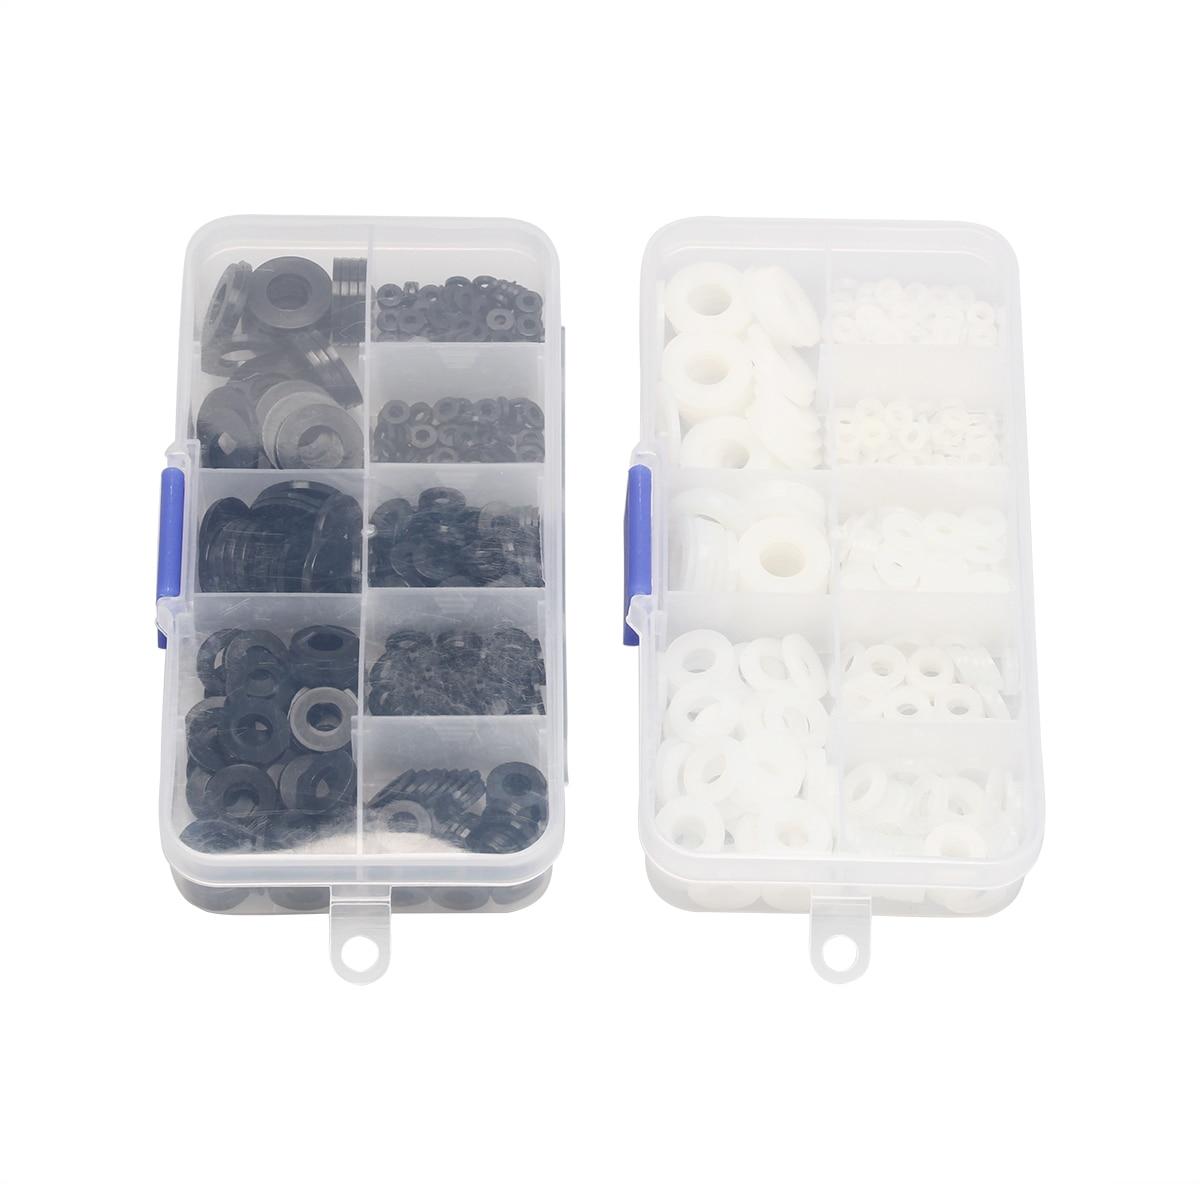 500 uds, plástico negro/blanco, Nylon M2 M2.5 M3 M4 M5 M6 M8, arandela plana chapada, espaciador, sellos de arandela, Kit de juntas